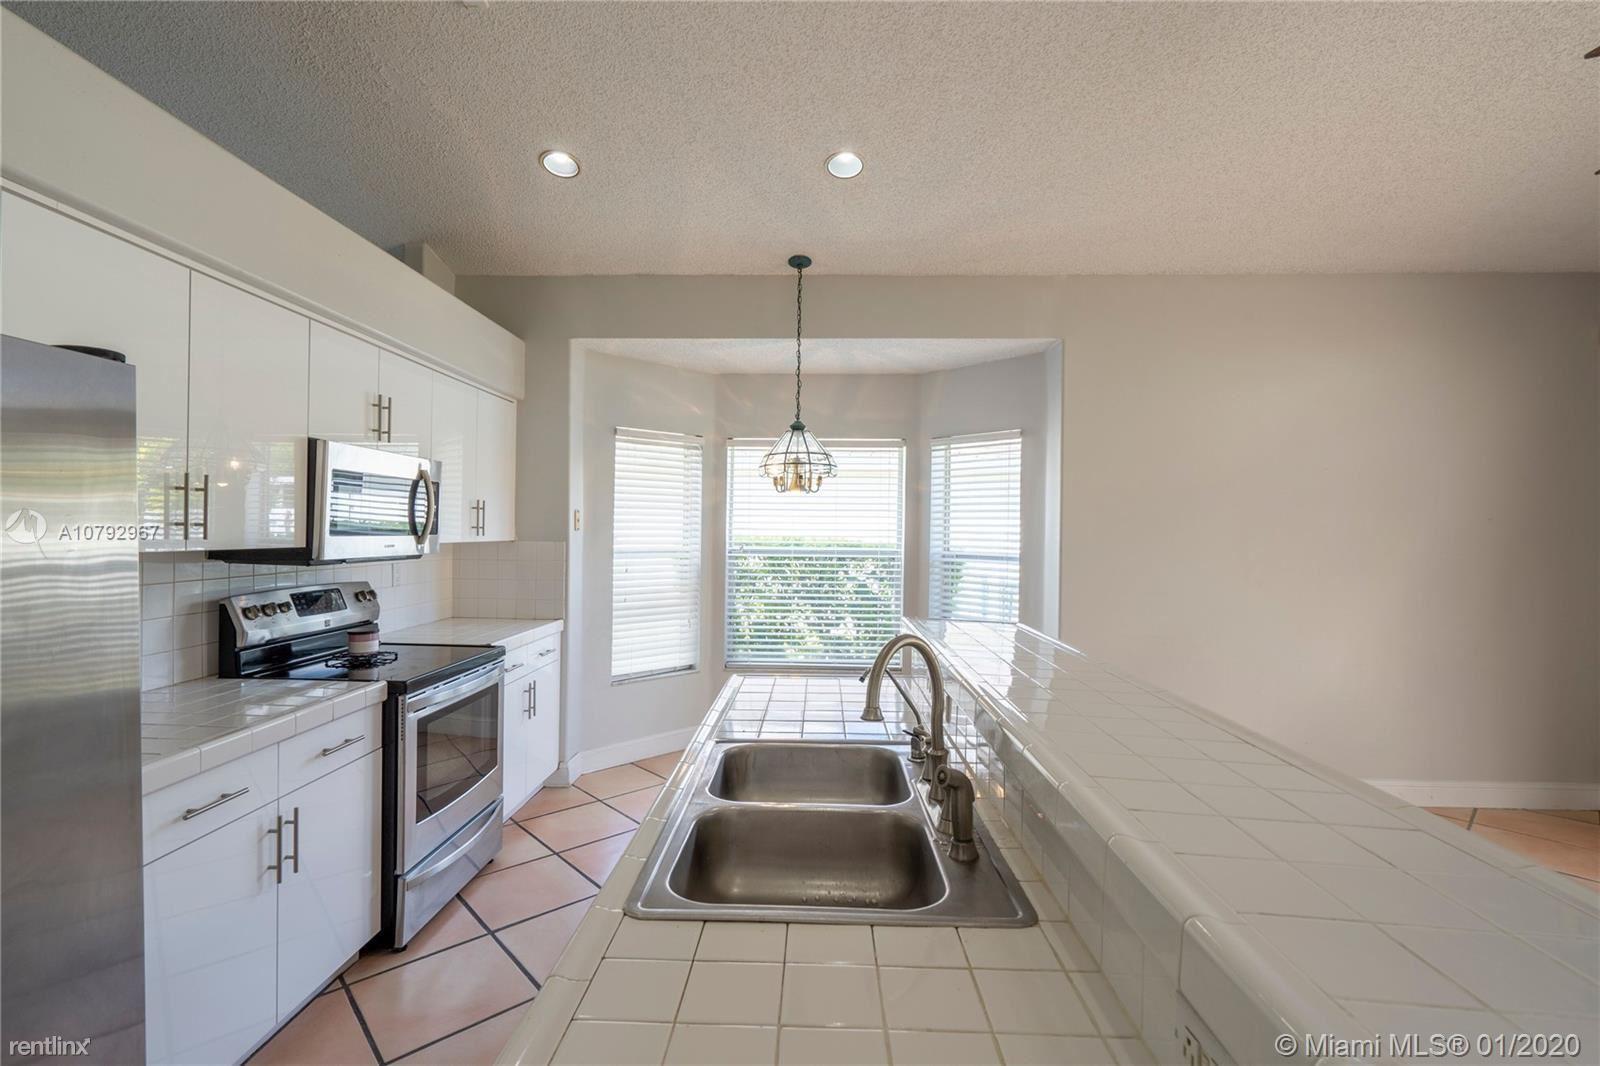 2487 NW 187th Ave, Pembroke Pines, FL - $2,800